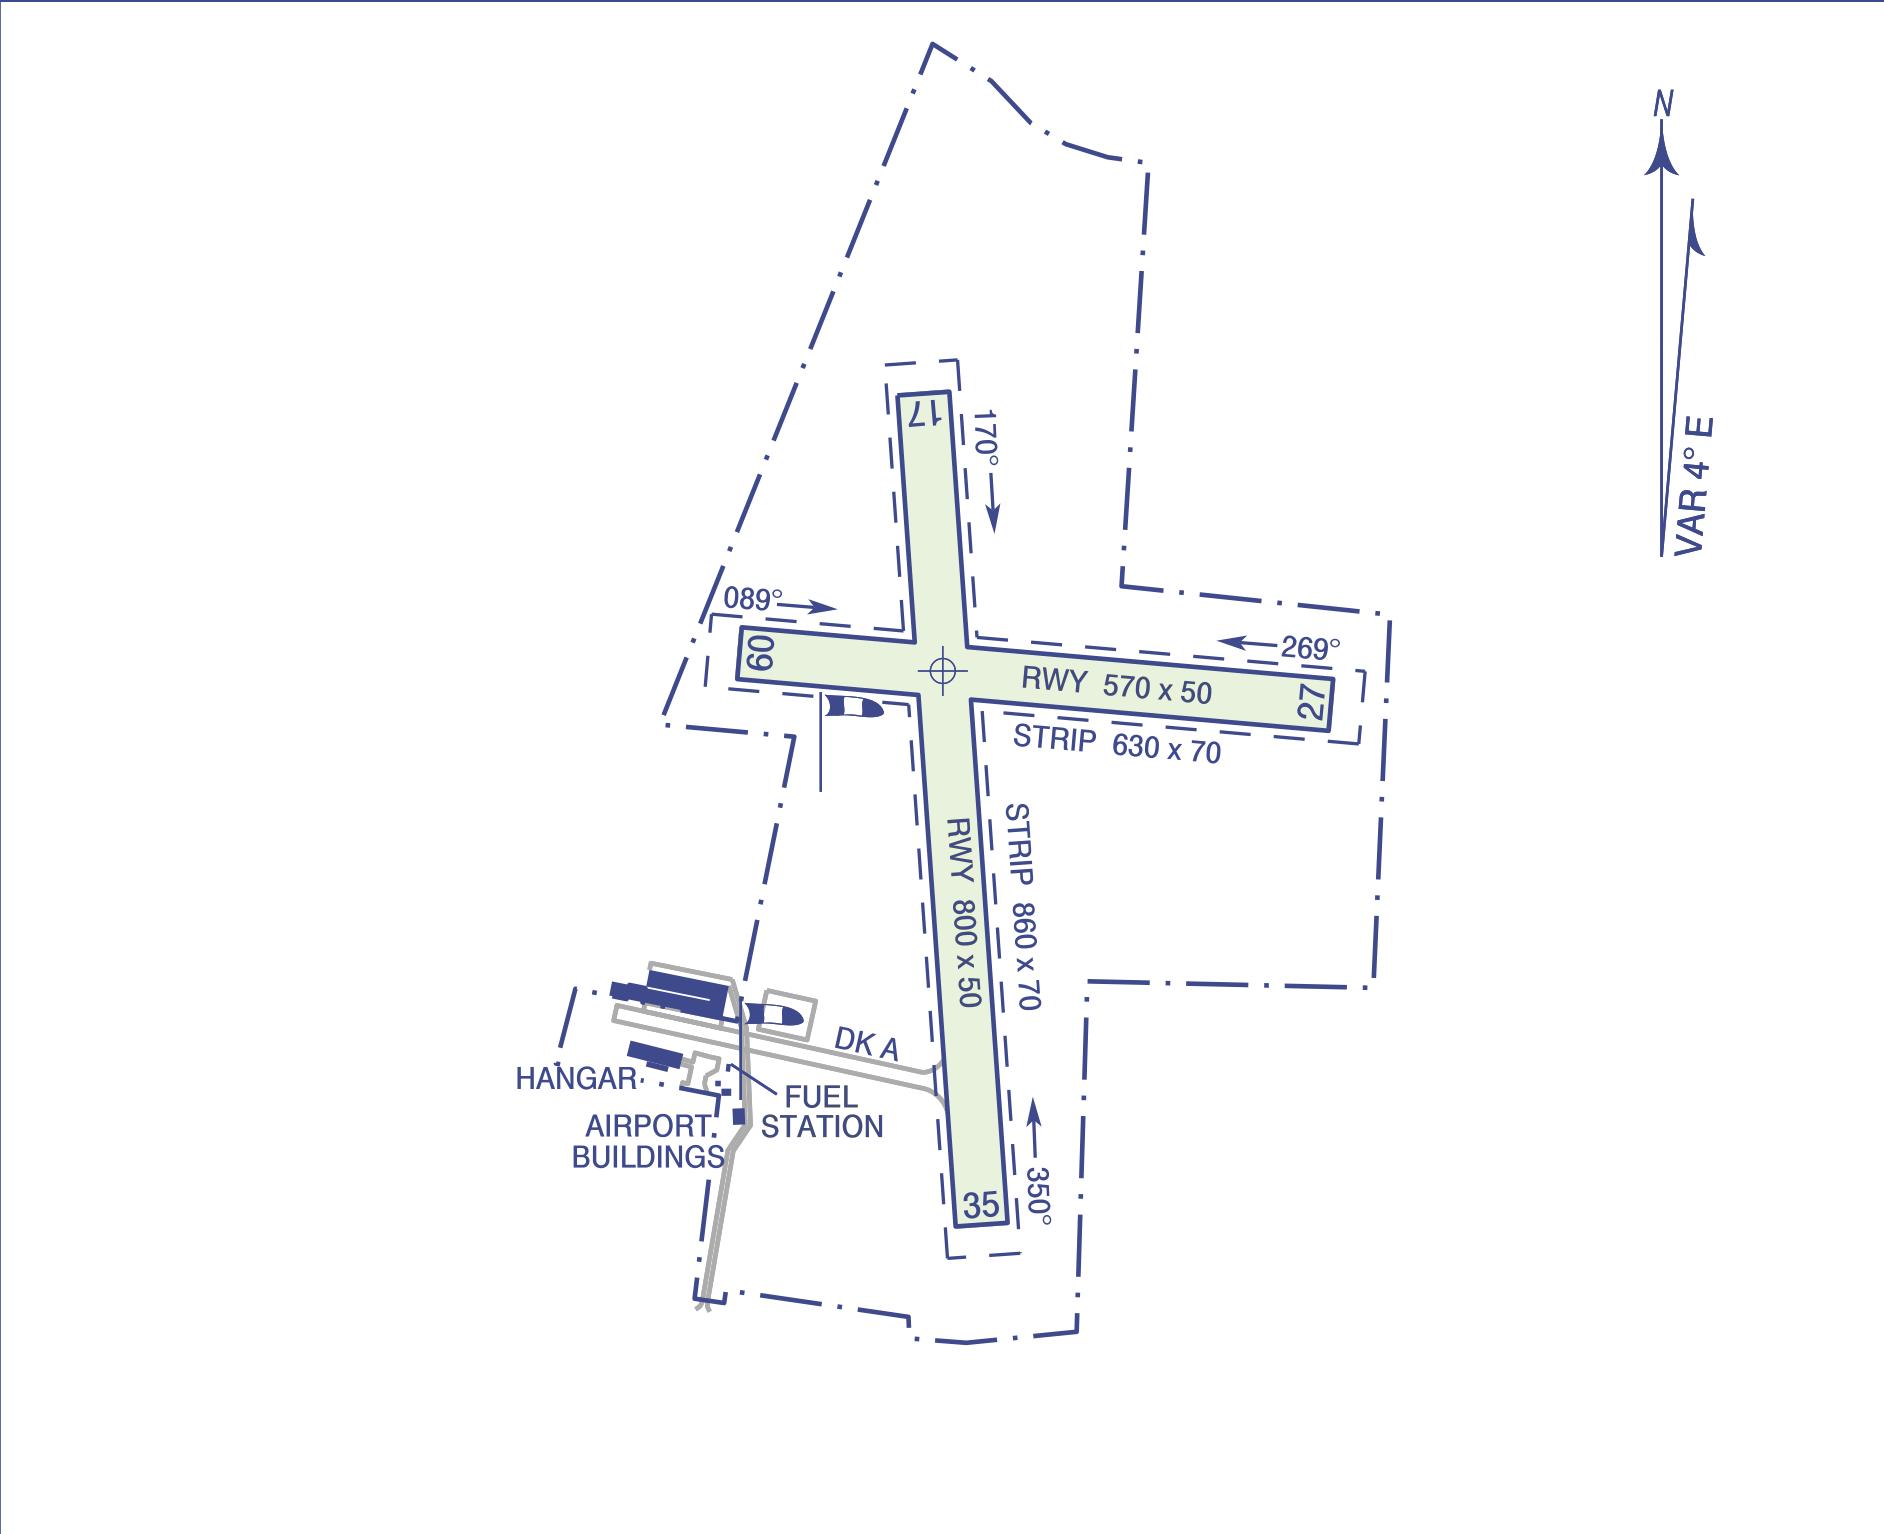 lotnisko mapa